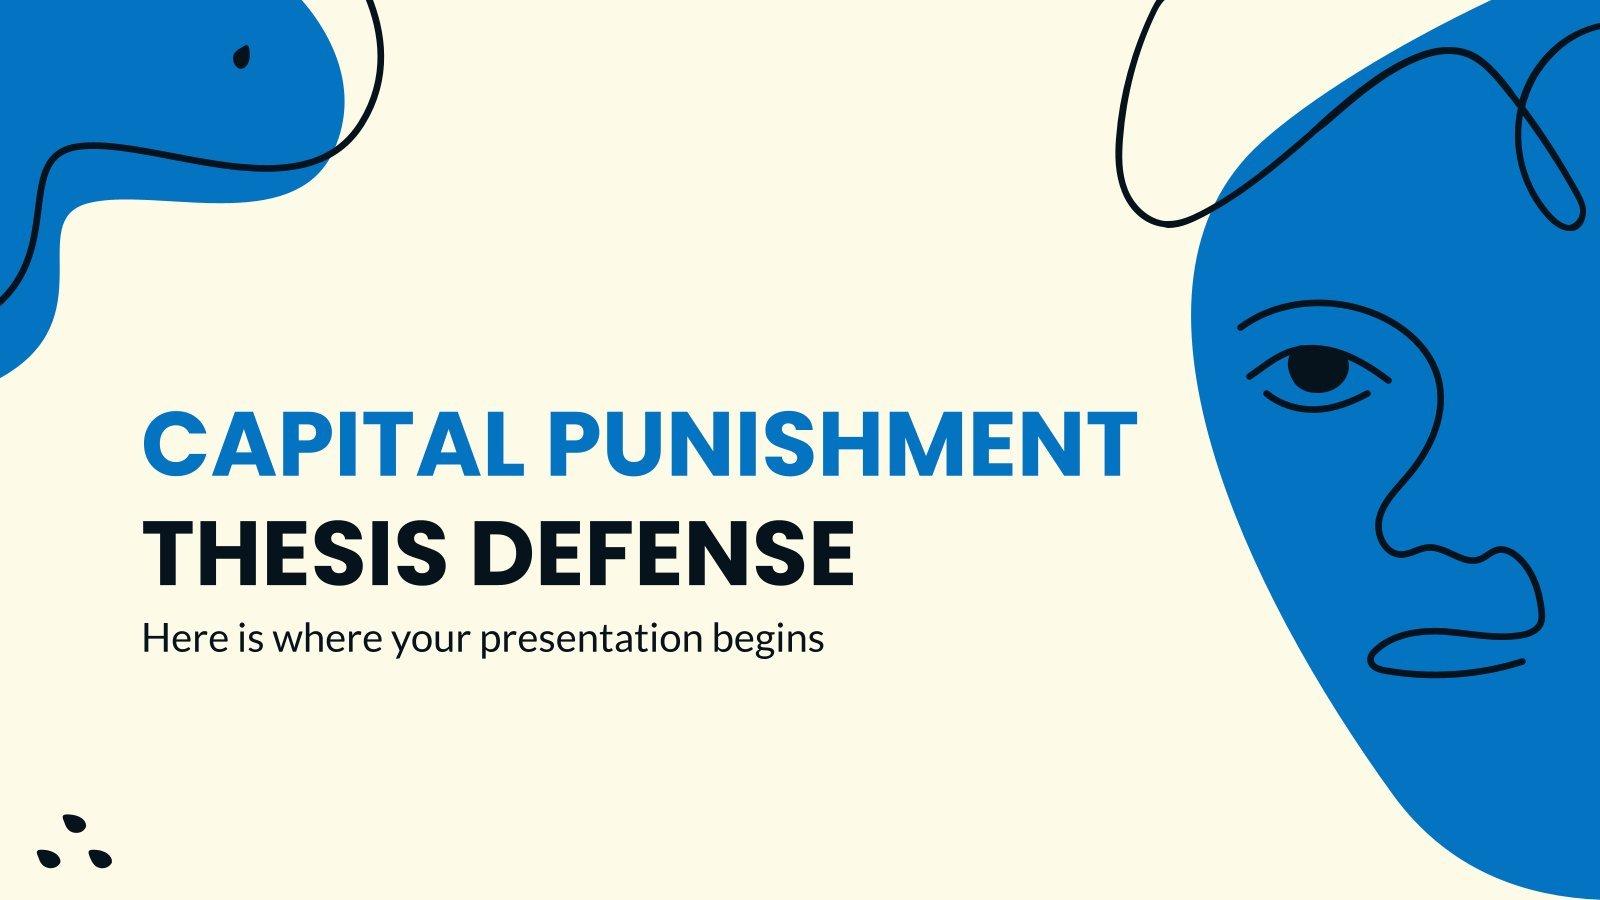 Capital Punishment Thesis Defense presentation template